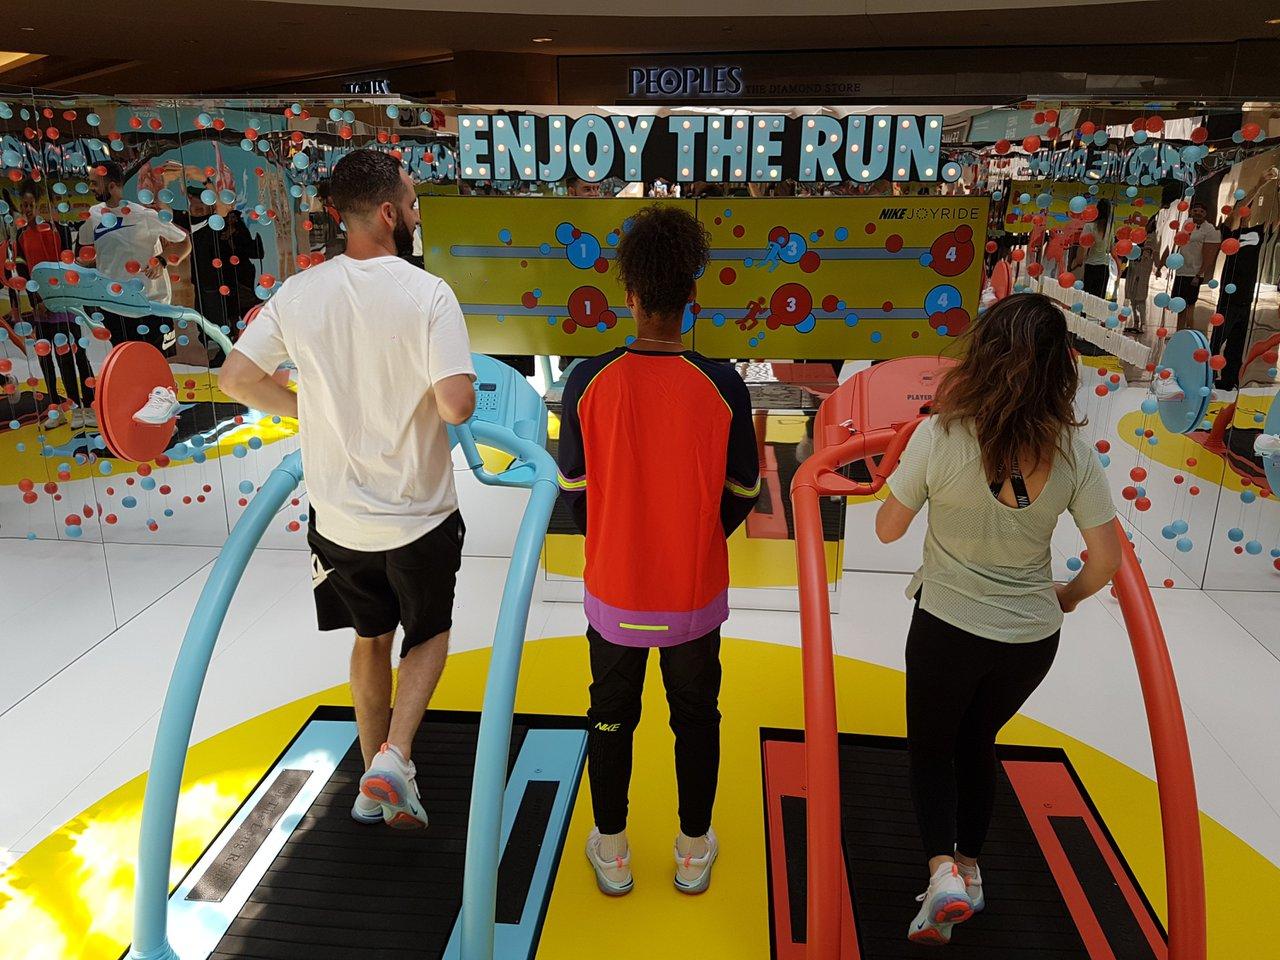 Nike Treadmill photo 20190815_115321.jpg